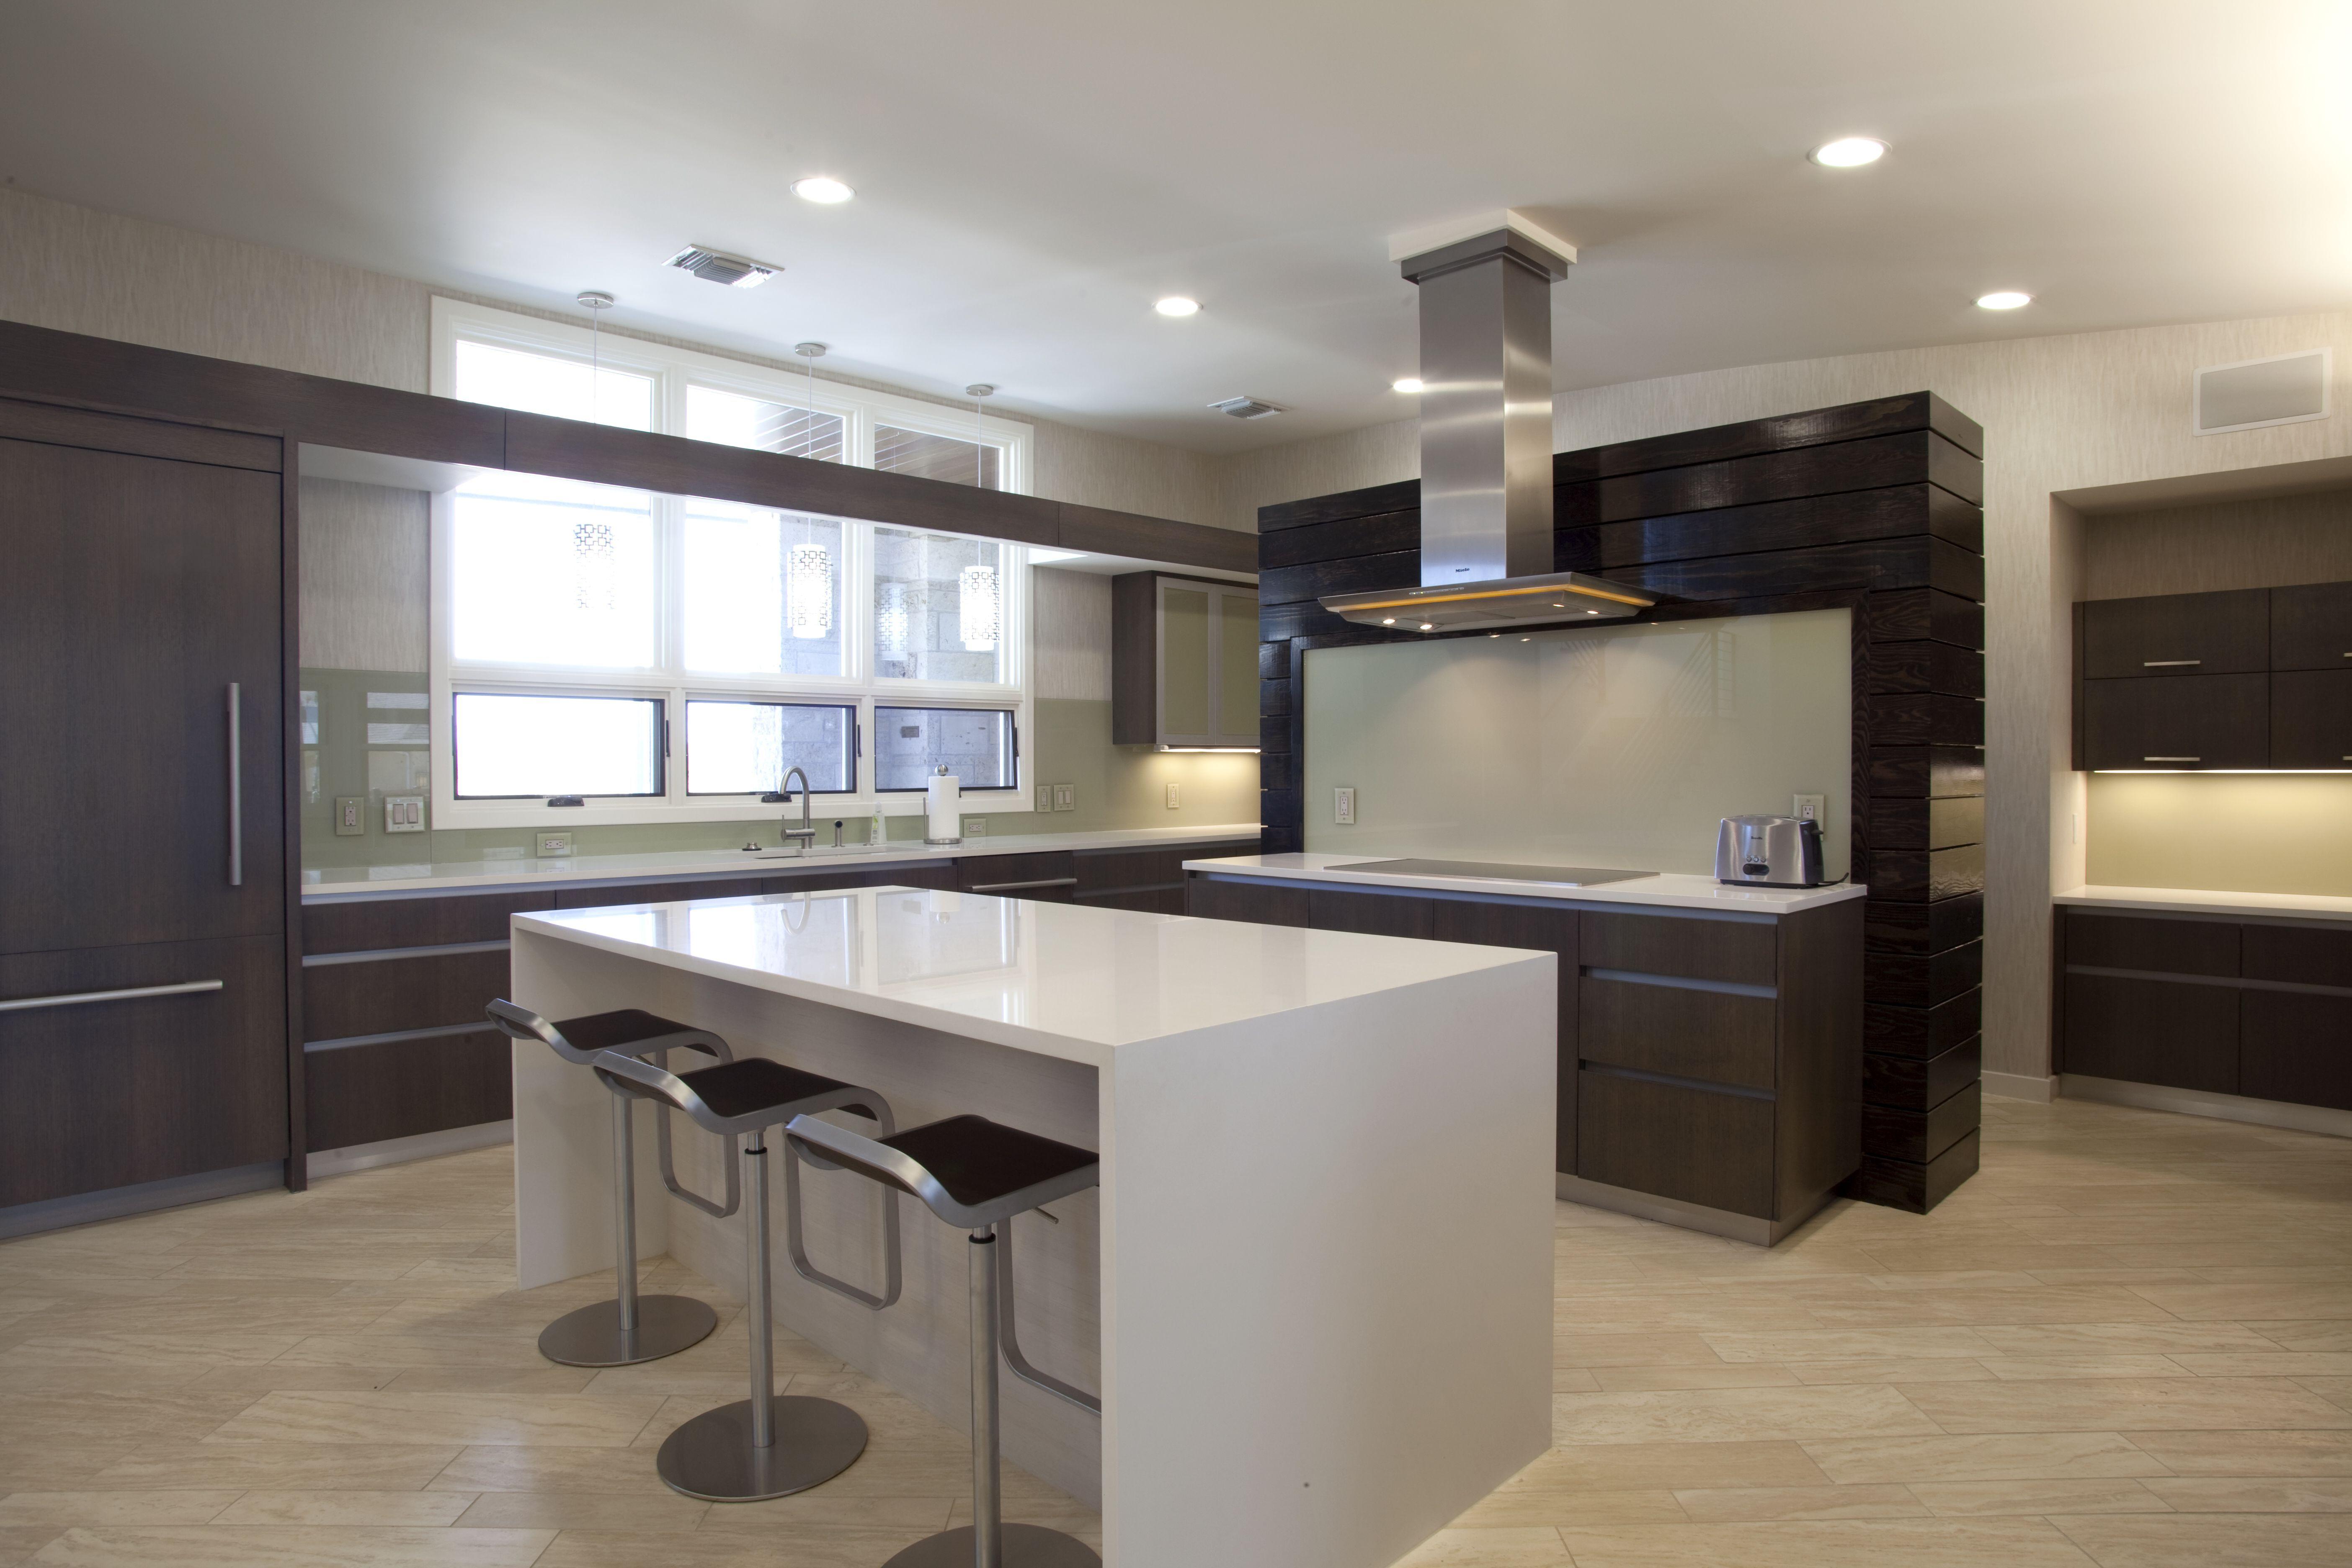 white quartz countertop in showing the luxurious kitchen white quartz countertops of kitchen on kitchen island ideas white quartz id=52770